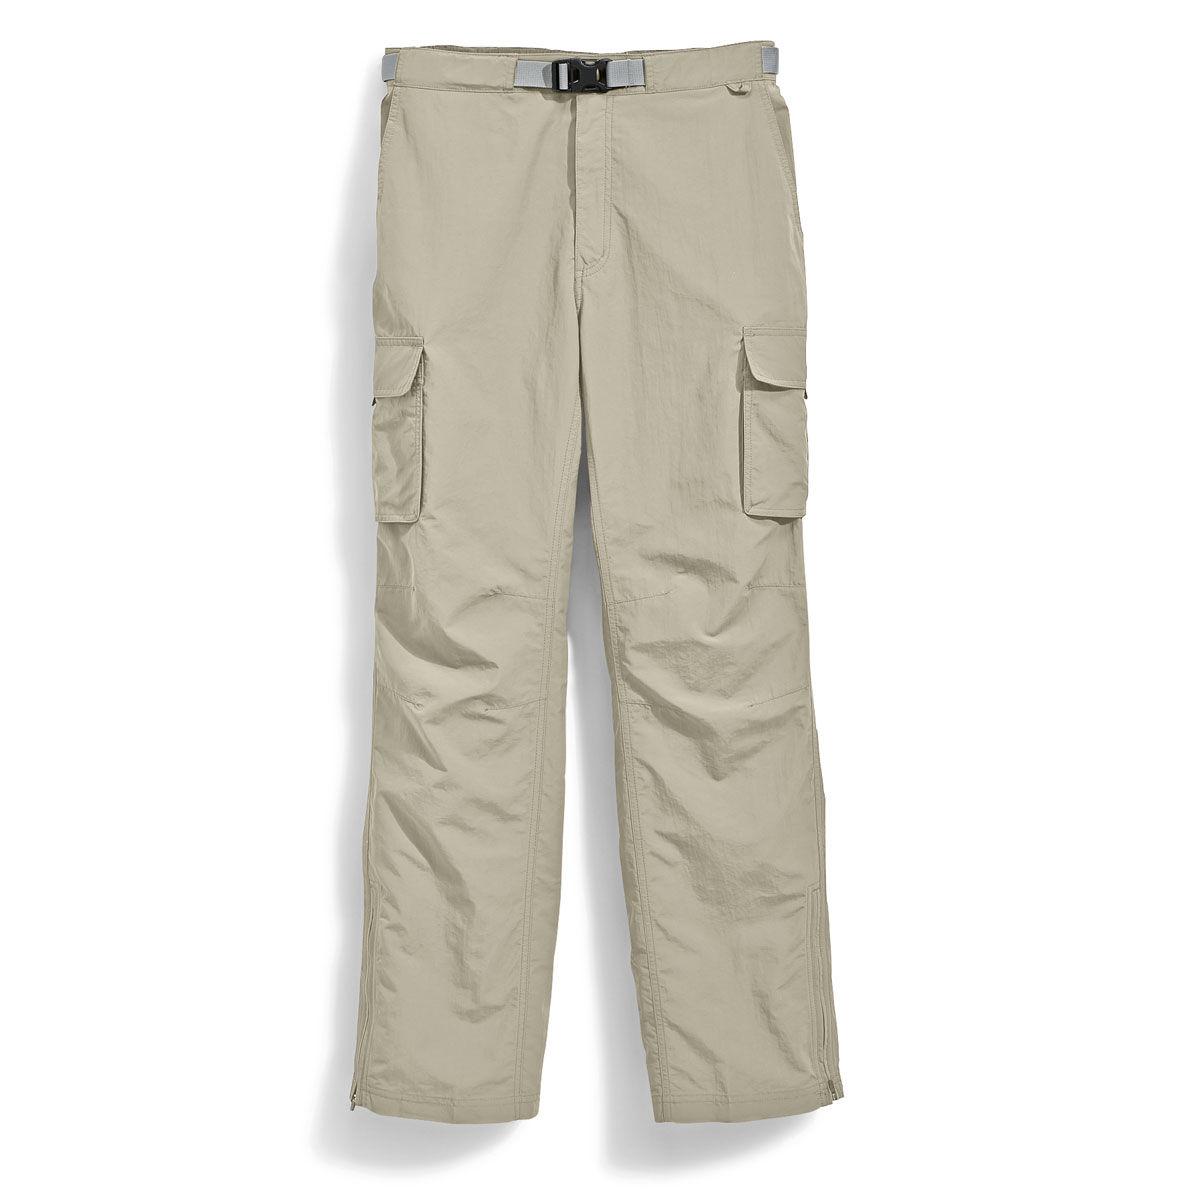 EMS Camp Cargo Pant